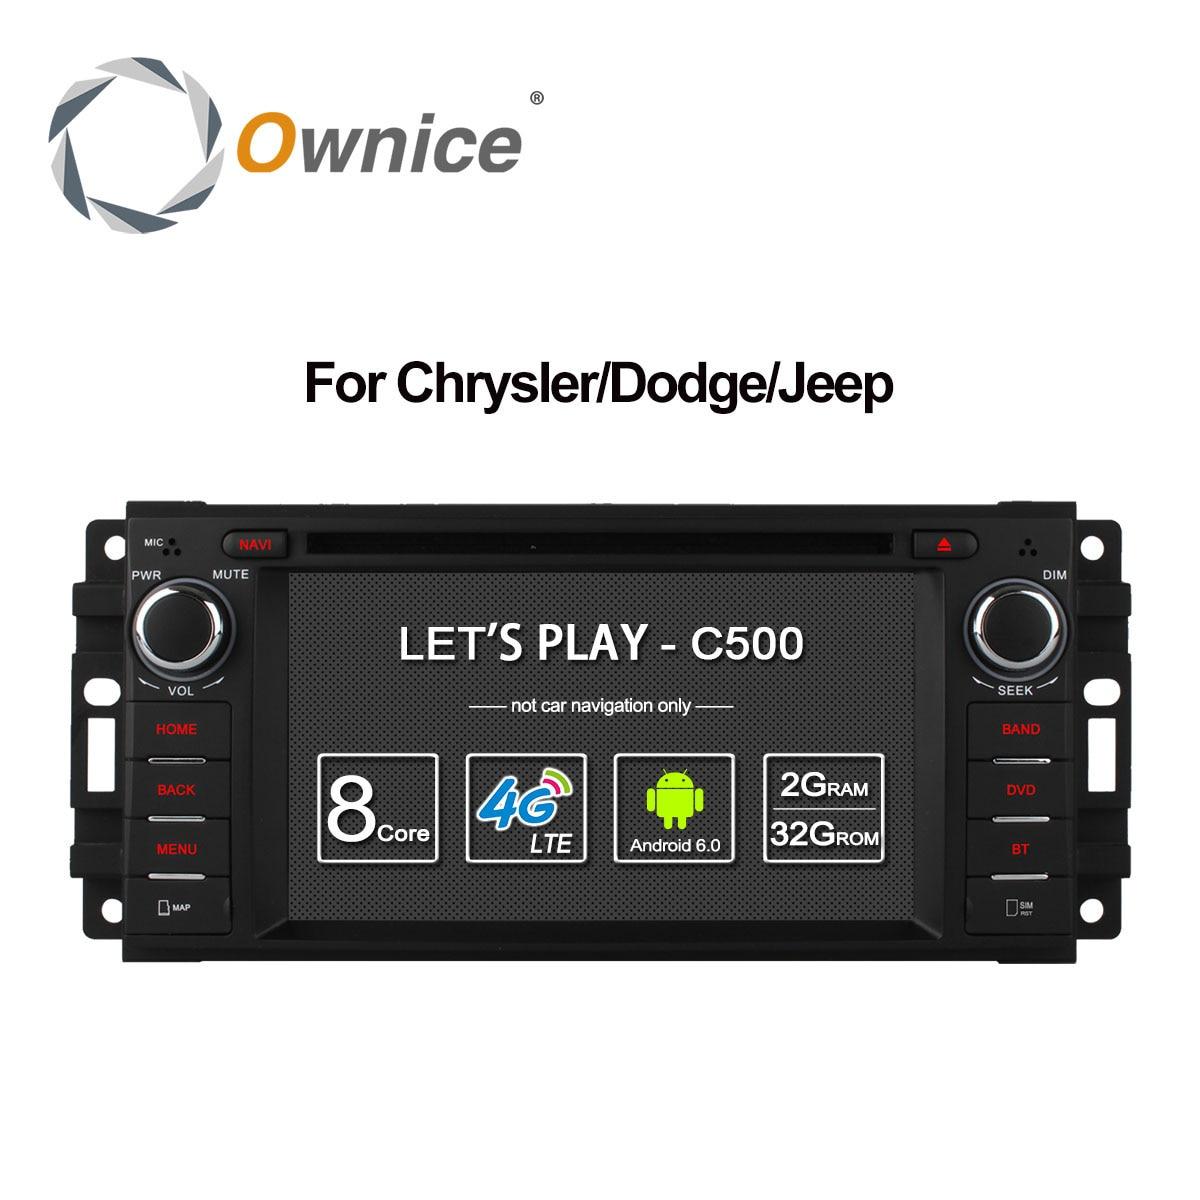 Ownice C500 Android 6.0 Octa Core car dvd player for Jeep grand wrangler 2015 patriot compass journey gps navi radio 4G LTE SIM ownice c500 4g sim lte octa 8 core android 6 0 for kia ceed 2013 2015 car dvd player gps navi radio wifi 4g bt 2gb ram 32g rom